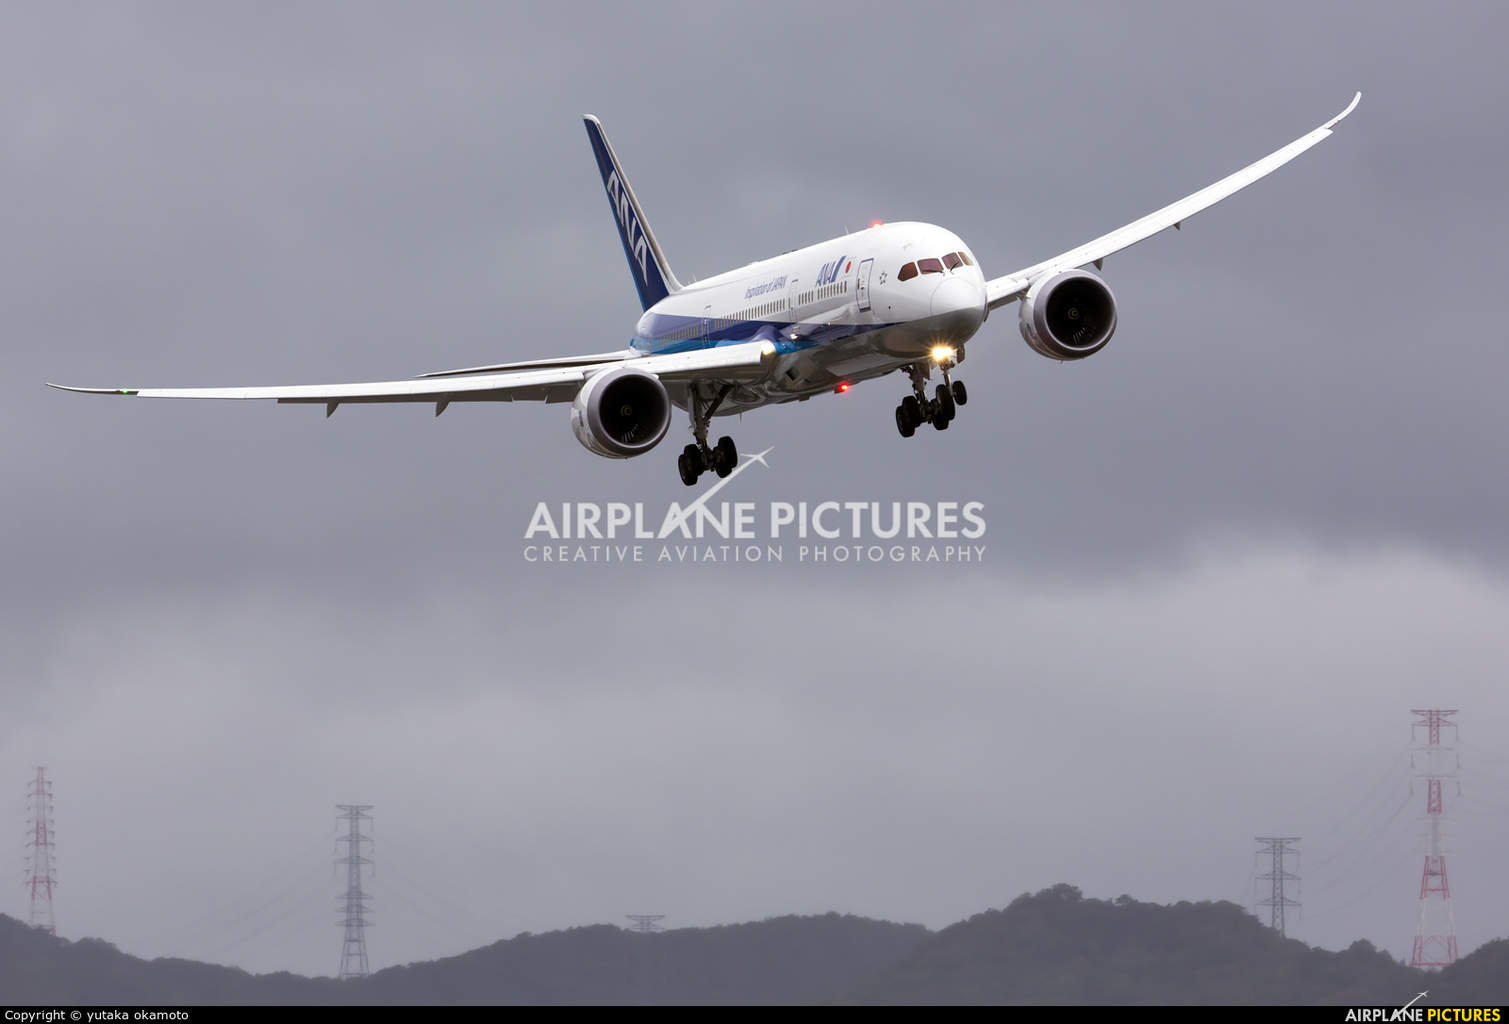 Boeing shows off Boeing 787-9 Dreamliner at Farnborough Airshow